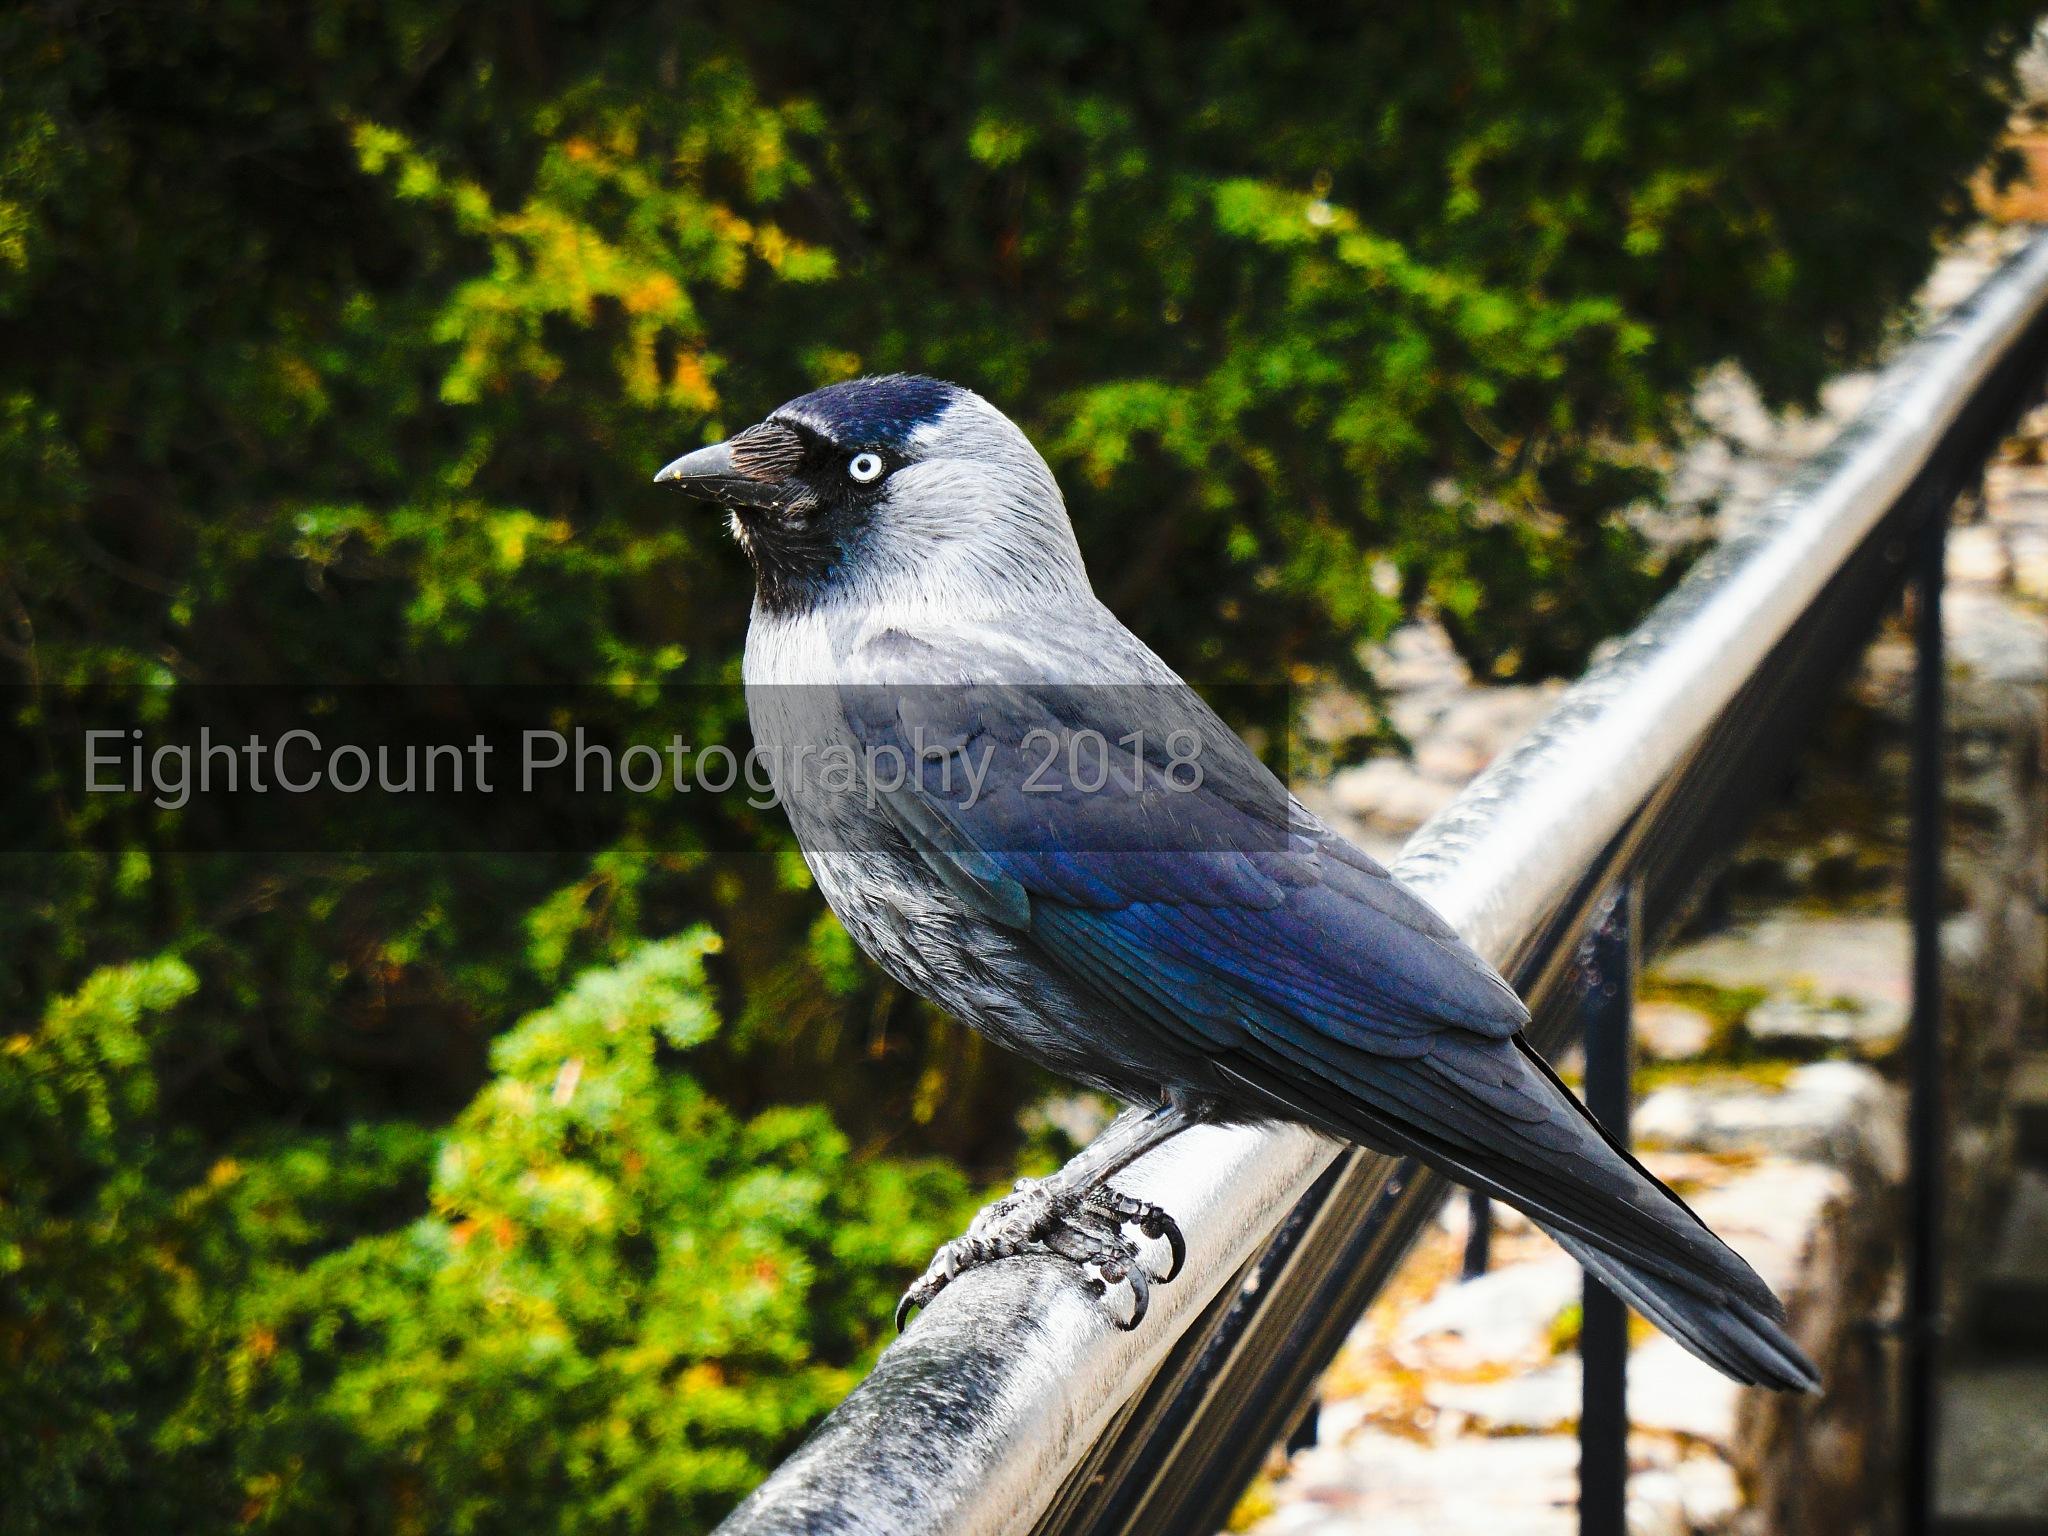 Blue Bird by EightCount Photography